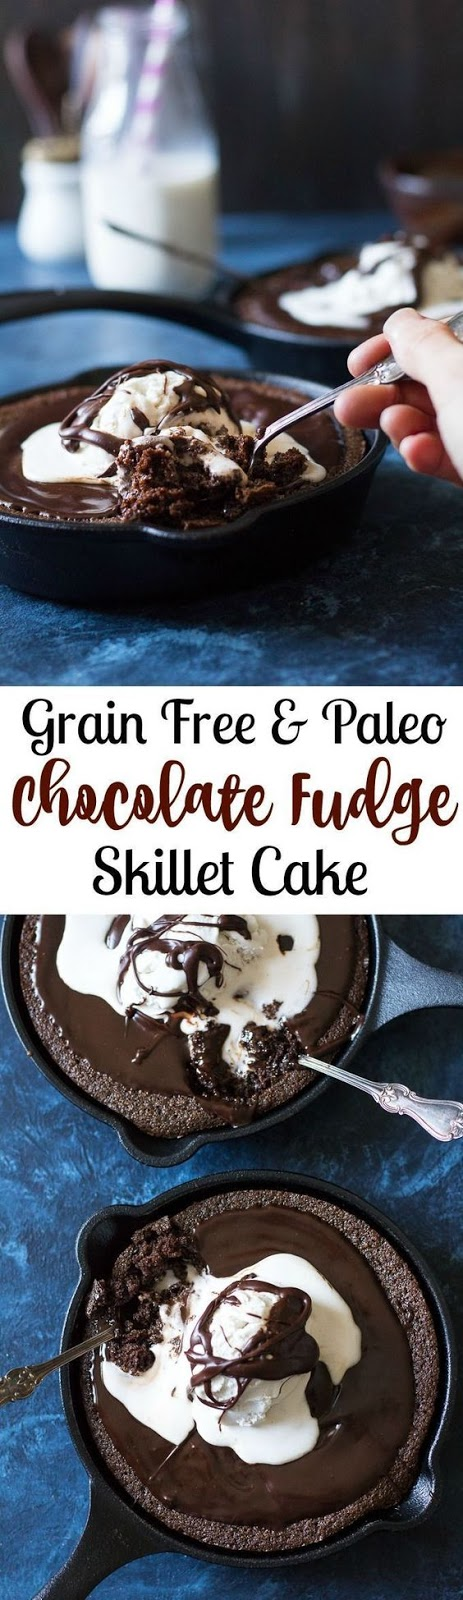 Fudgy Paleo Chocolate Skillet Cake Recipe